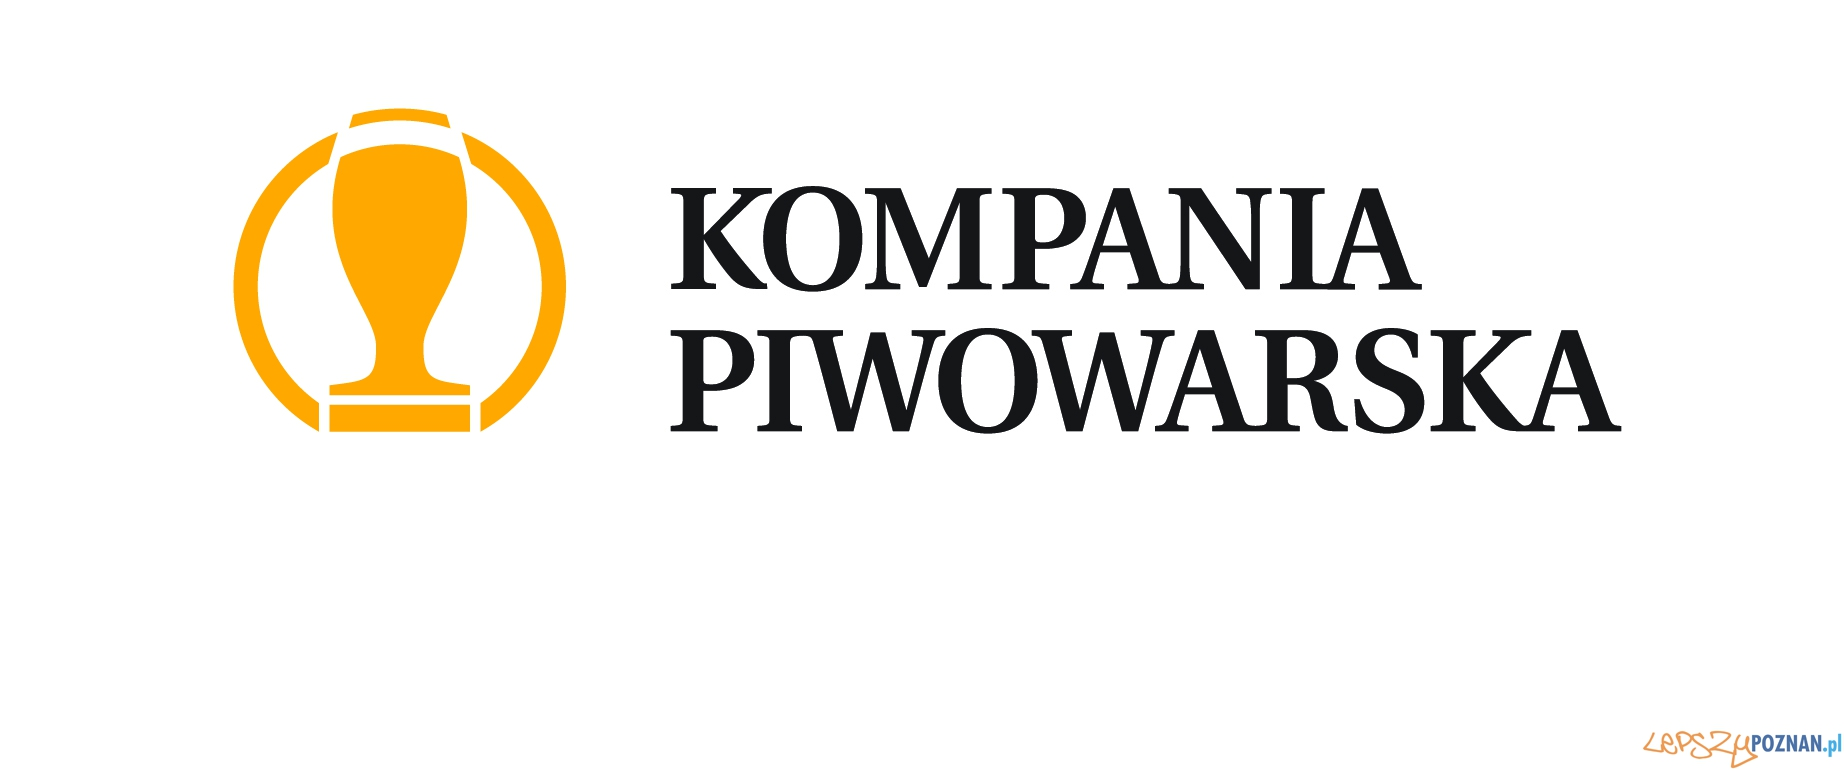 Kompania Piwowarska logo  Foto: Kompania Piwowarska logo